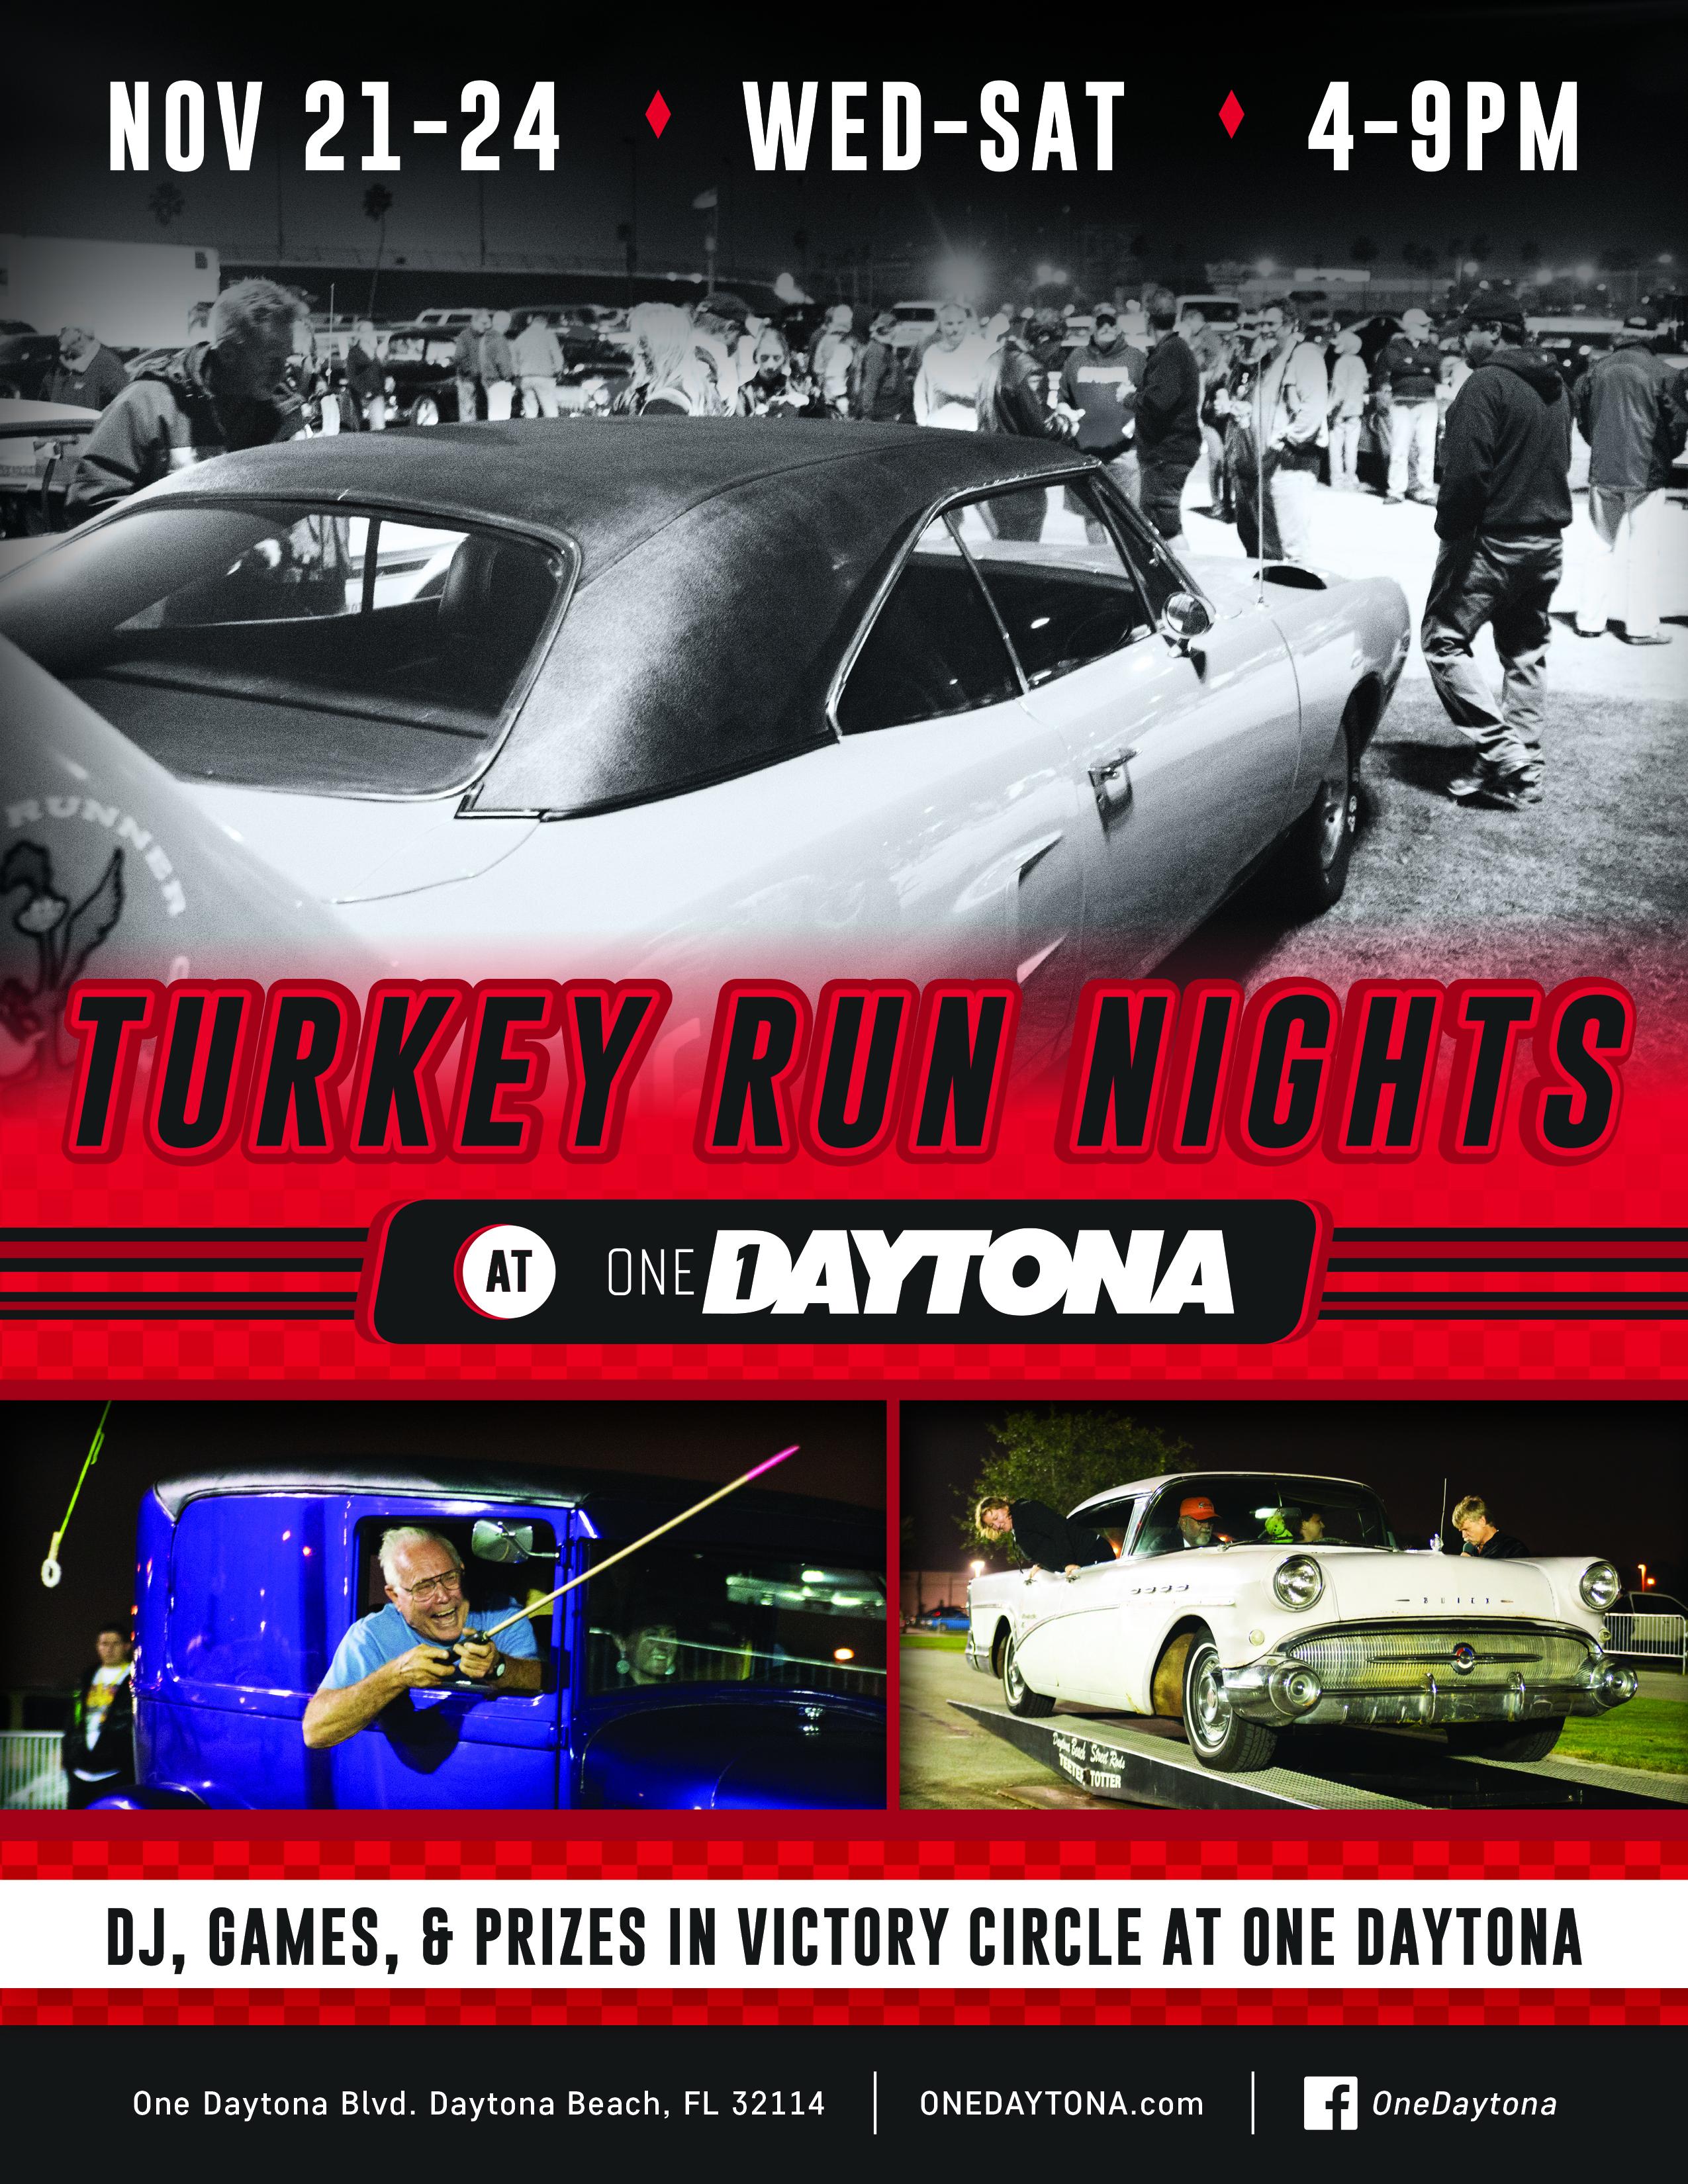 Daytona Turkey Run flyer